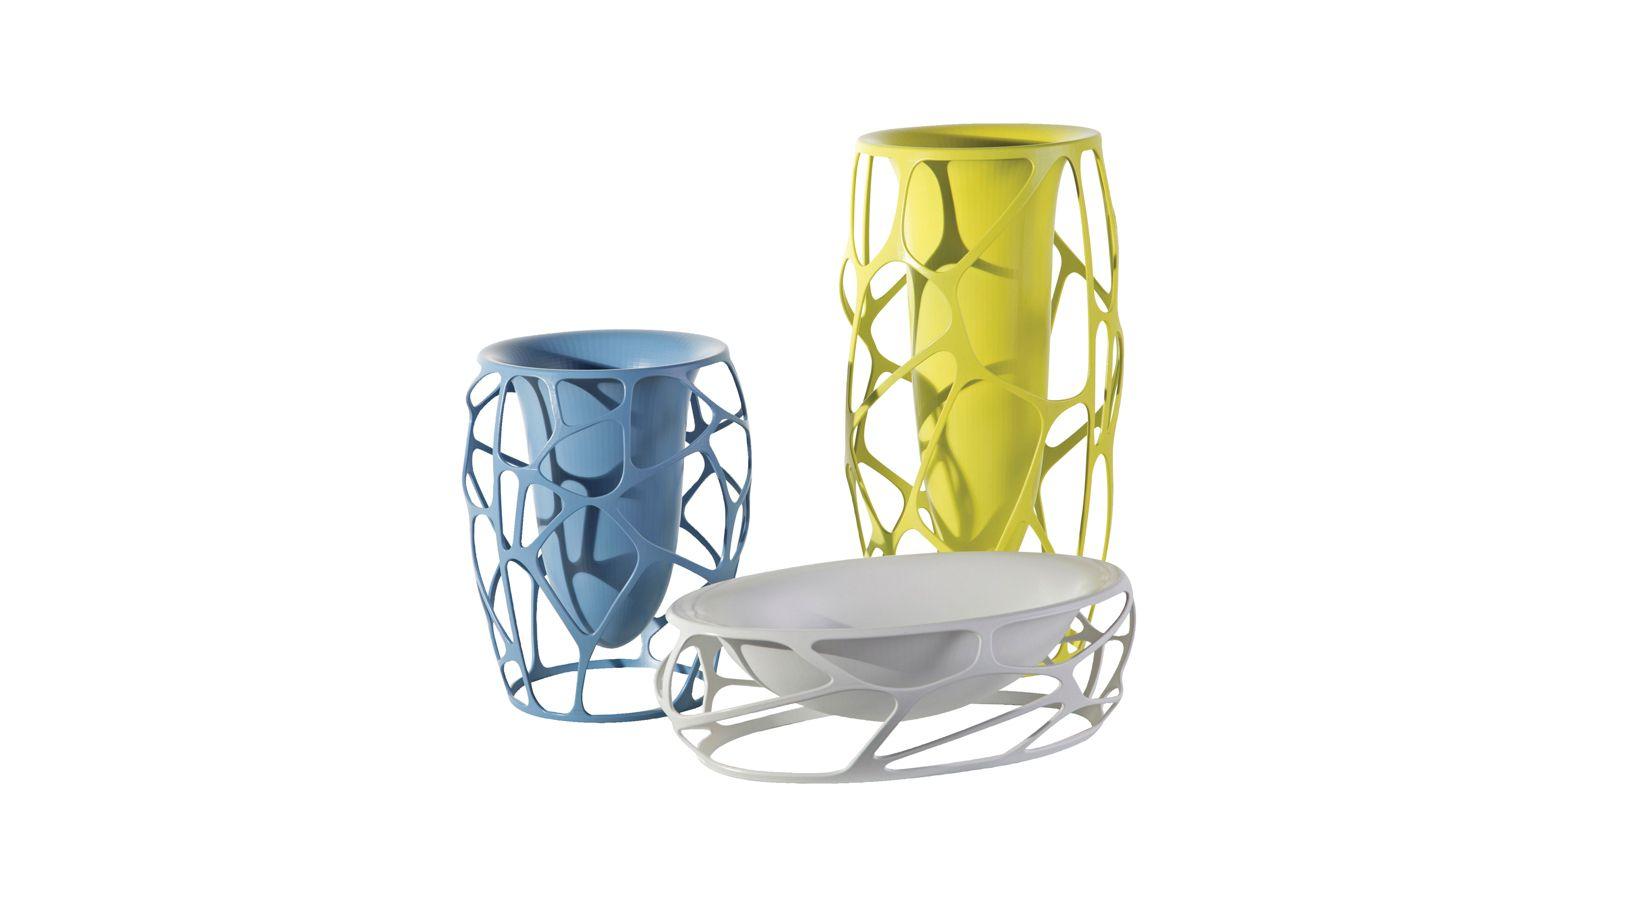 suspens dining table roche bobois. Black Bedroom Furniture Sets. Home Design Ideas